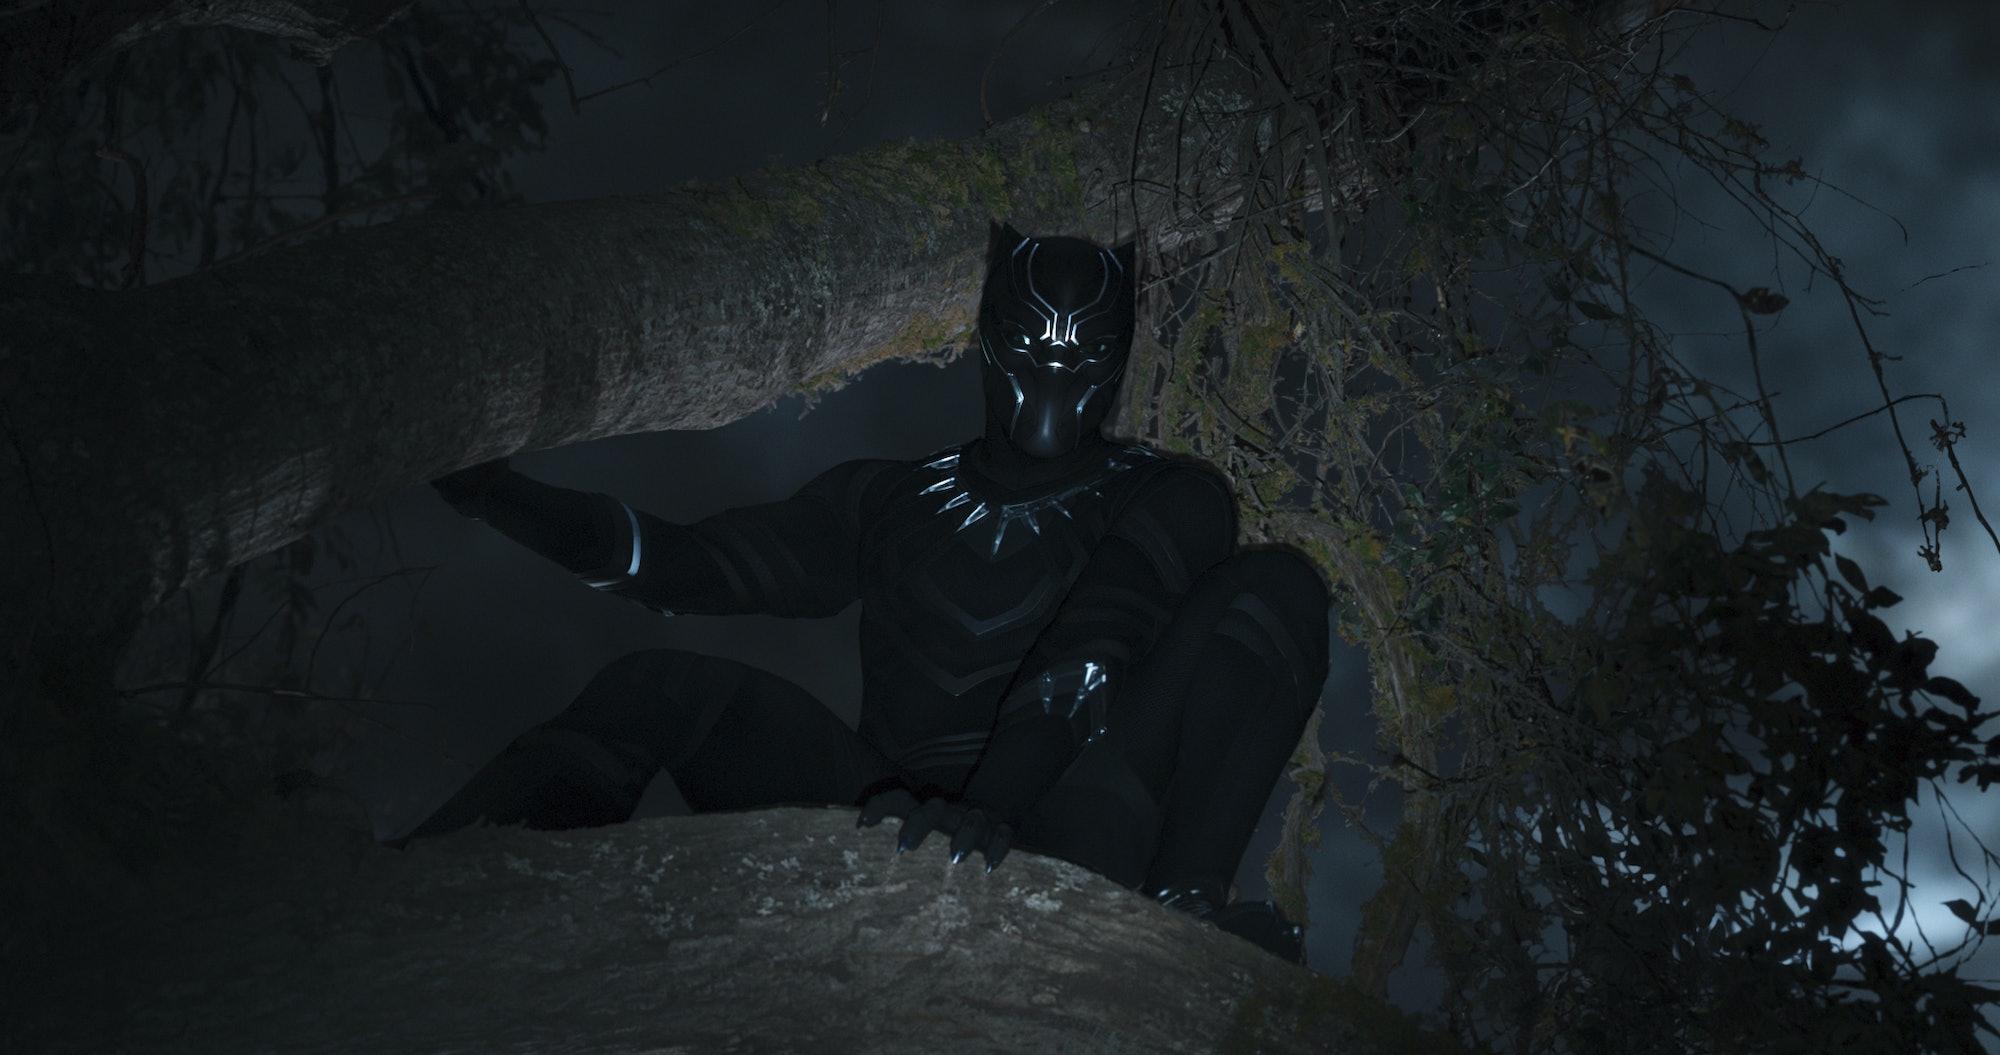 Black Panther 2 Sequel